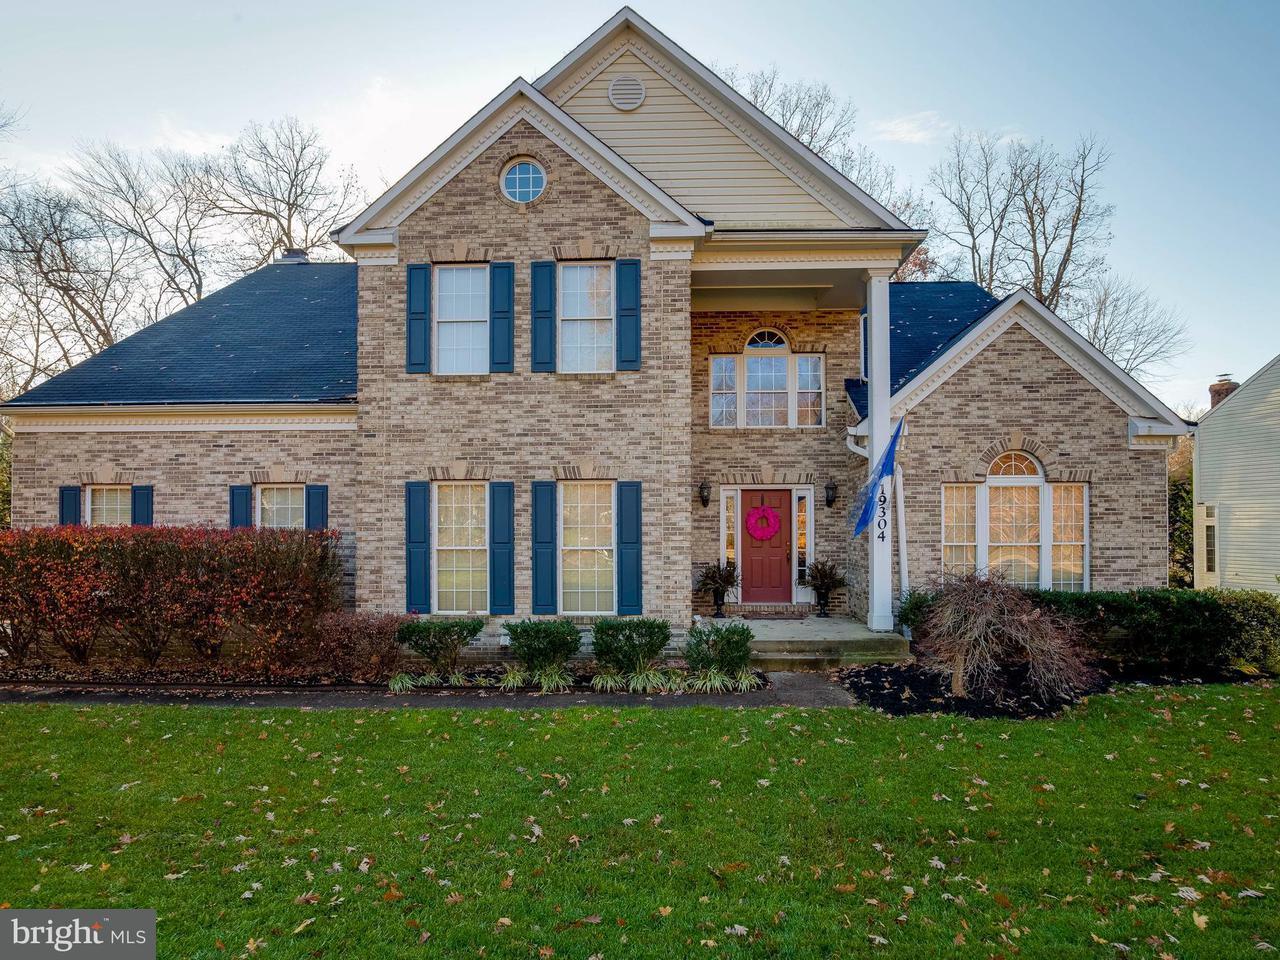 獨棟家庭住宅 為 出售 在 19304 Cissel Manor Drive 19304 Cissel Manor Drive Poolesville, 馬里蘭州 20837 美國